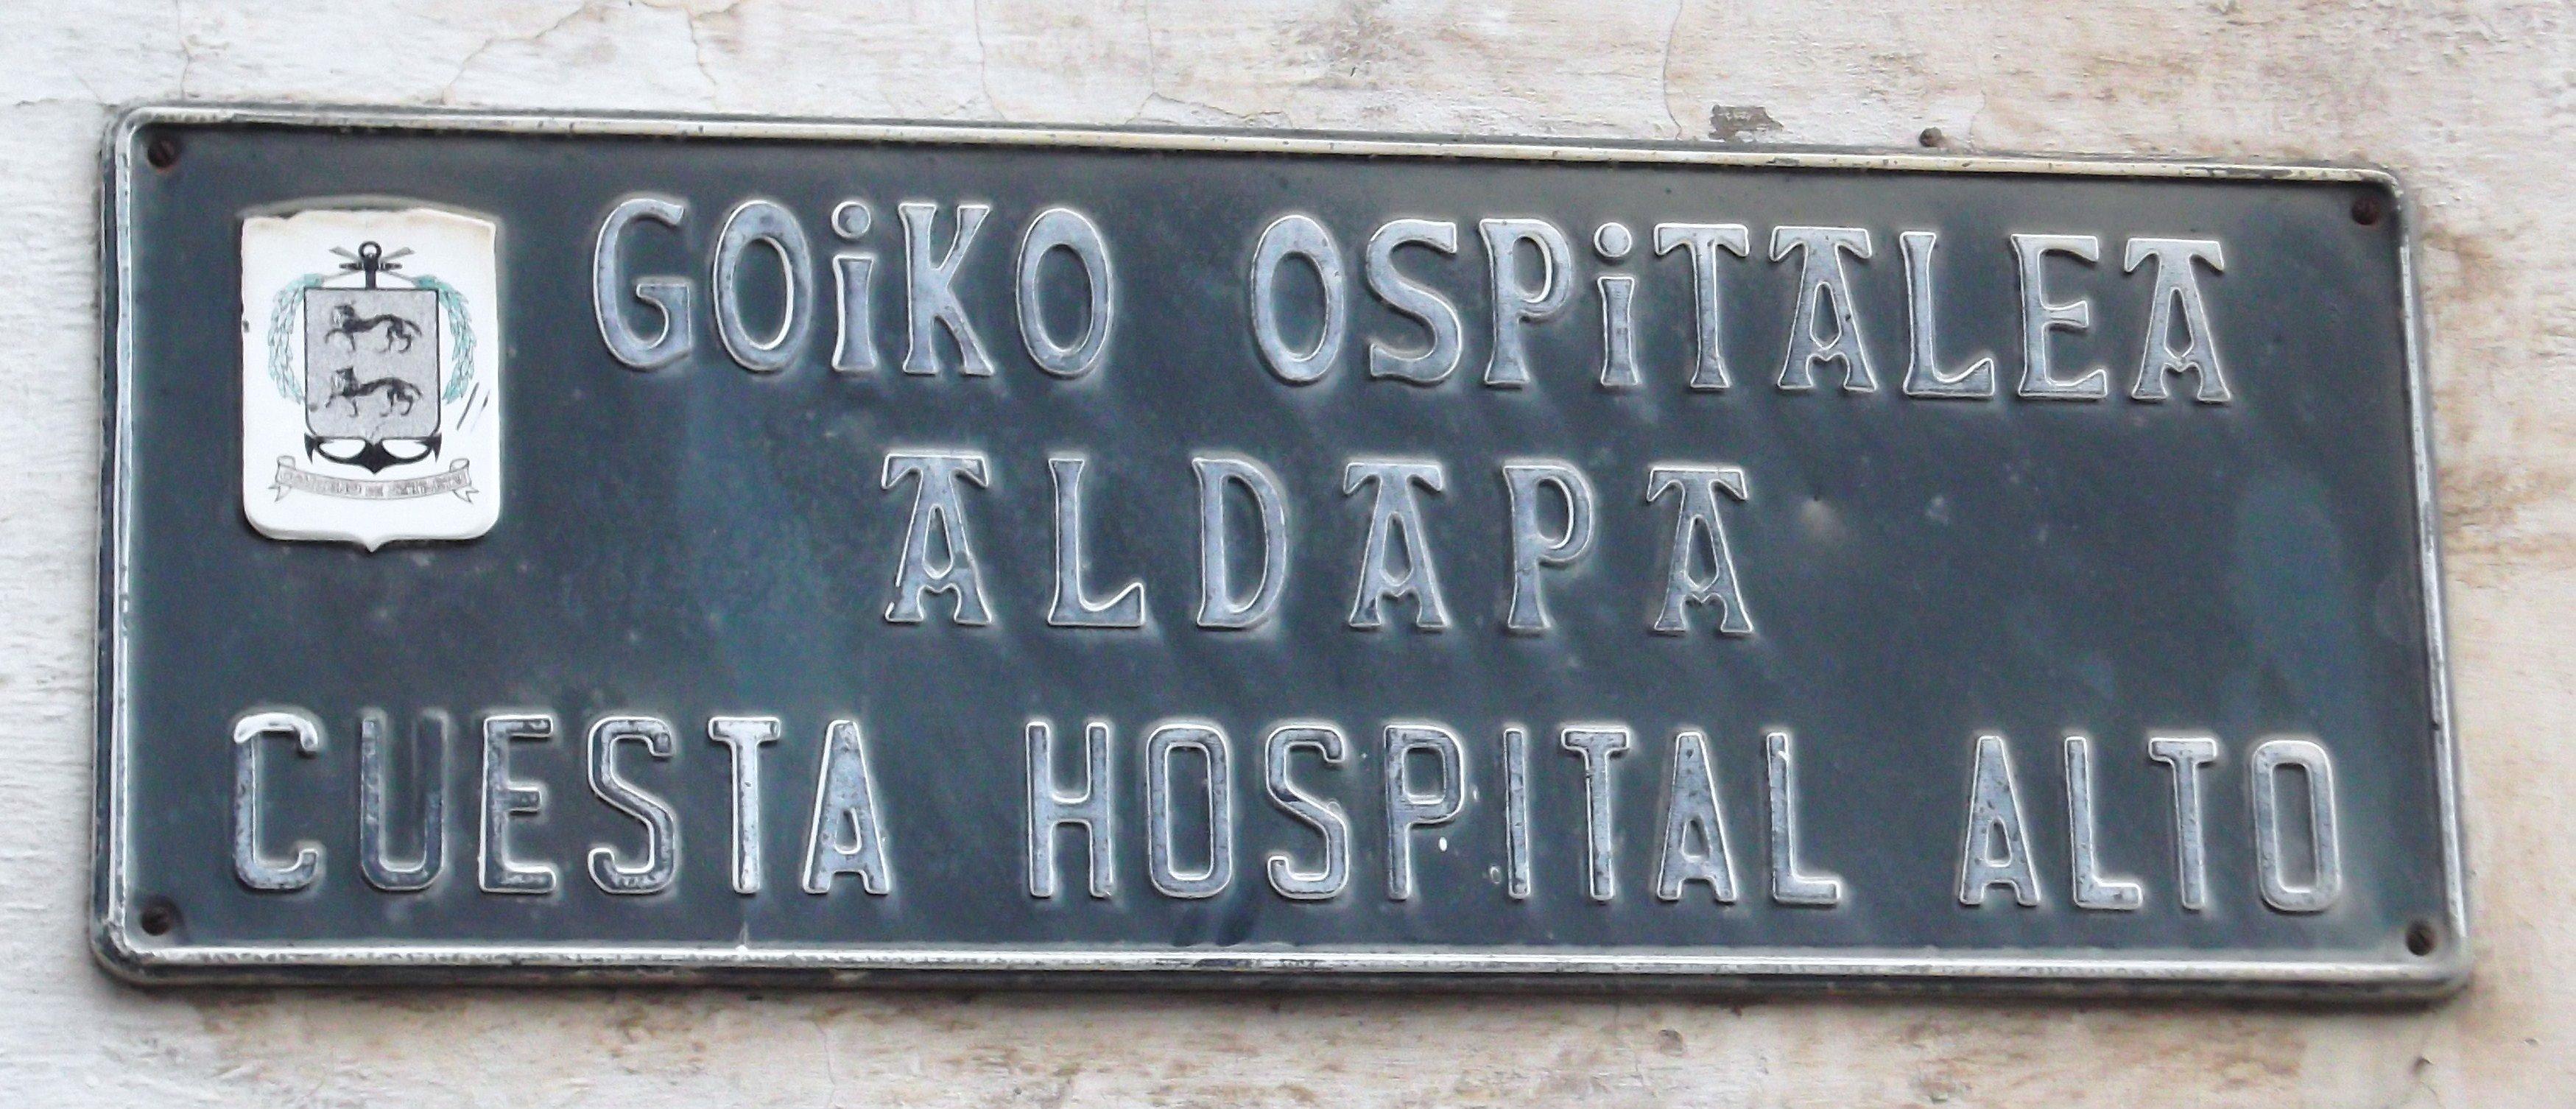 Cuesta Hospital Alto-3